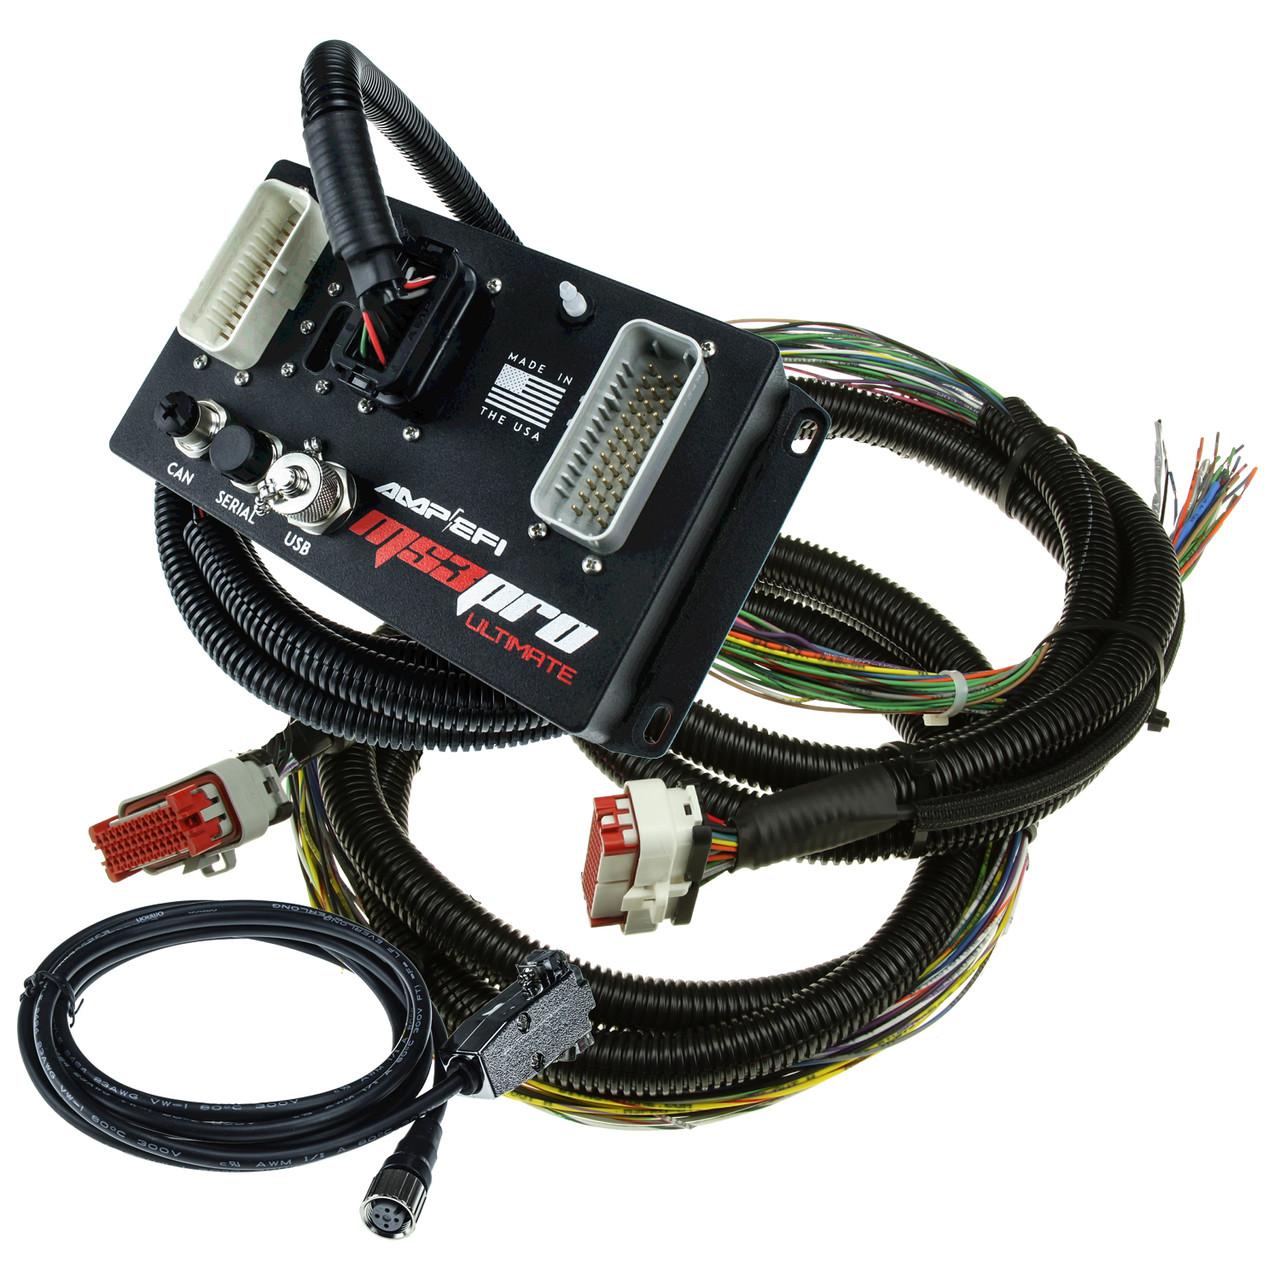 medium resolution of logic computer wire harness wiring diagram view logic computer wire harness